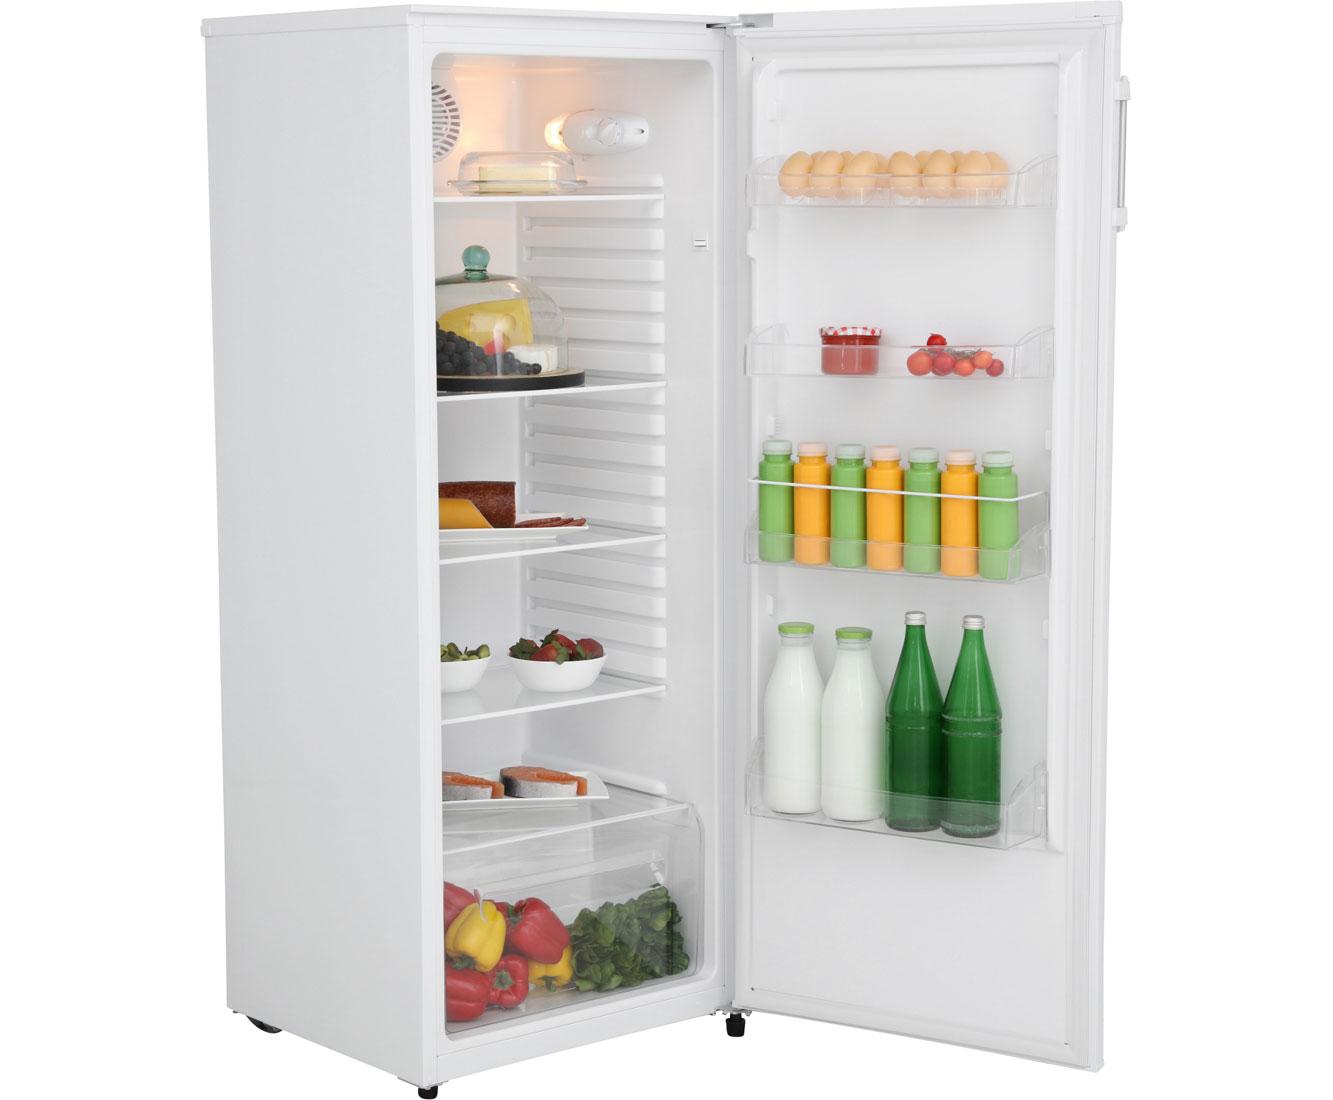 Bomann Kühlschrank Freistehend : Maße kühlschrank freistehend hisense fv306n4cw2 gefrierschrank